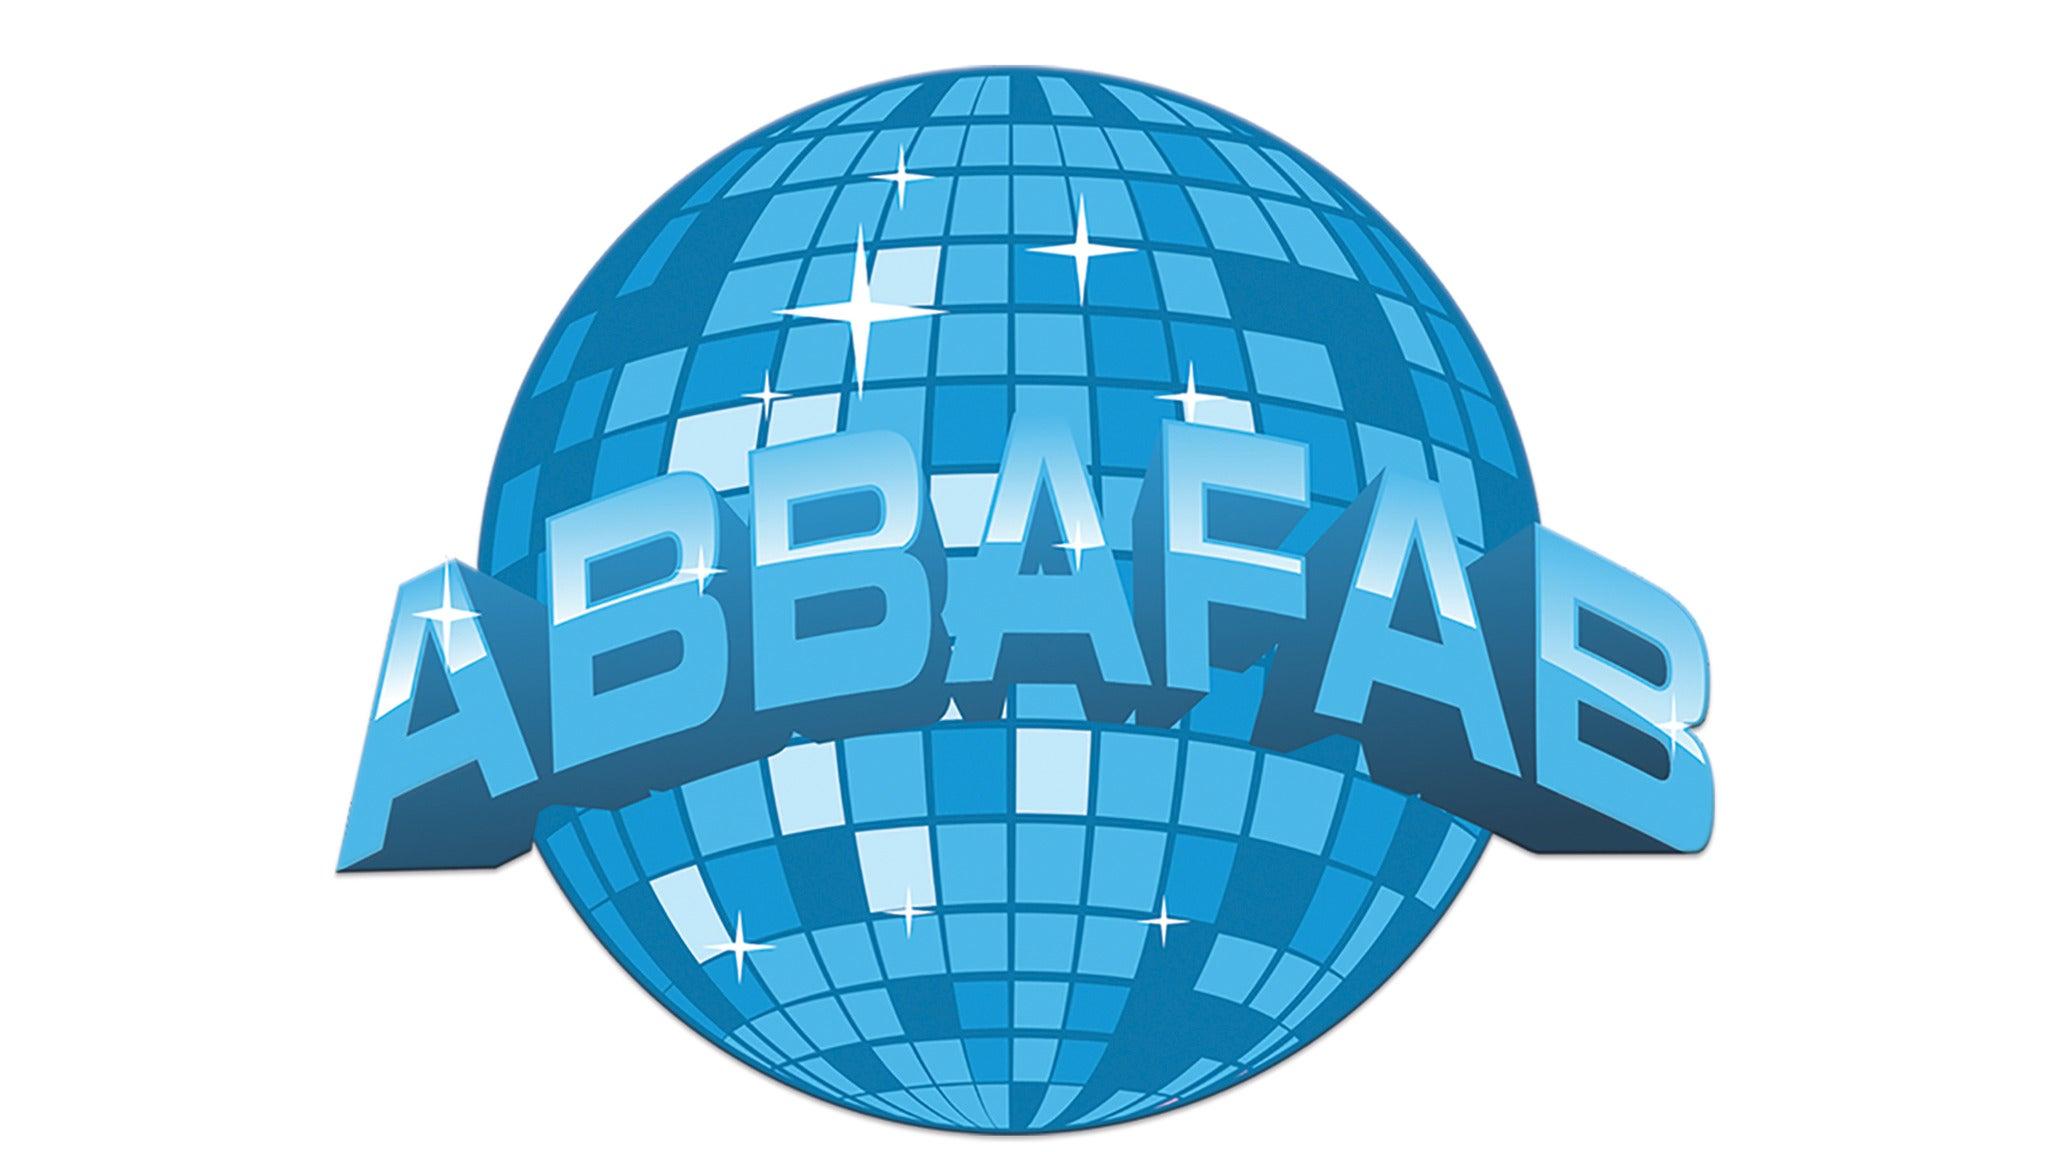 AbbaFab live